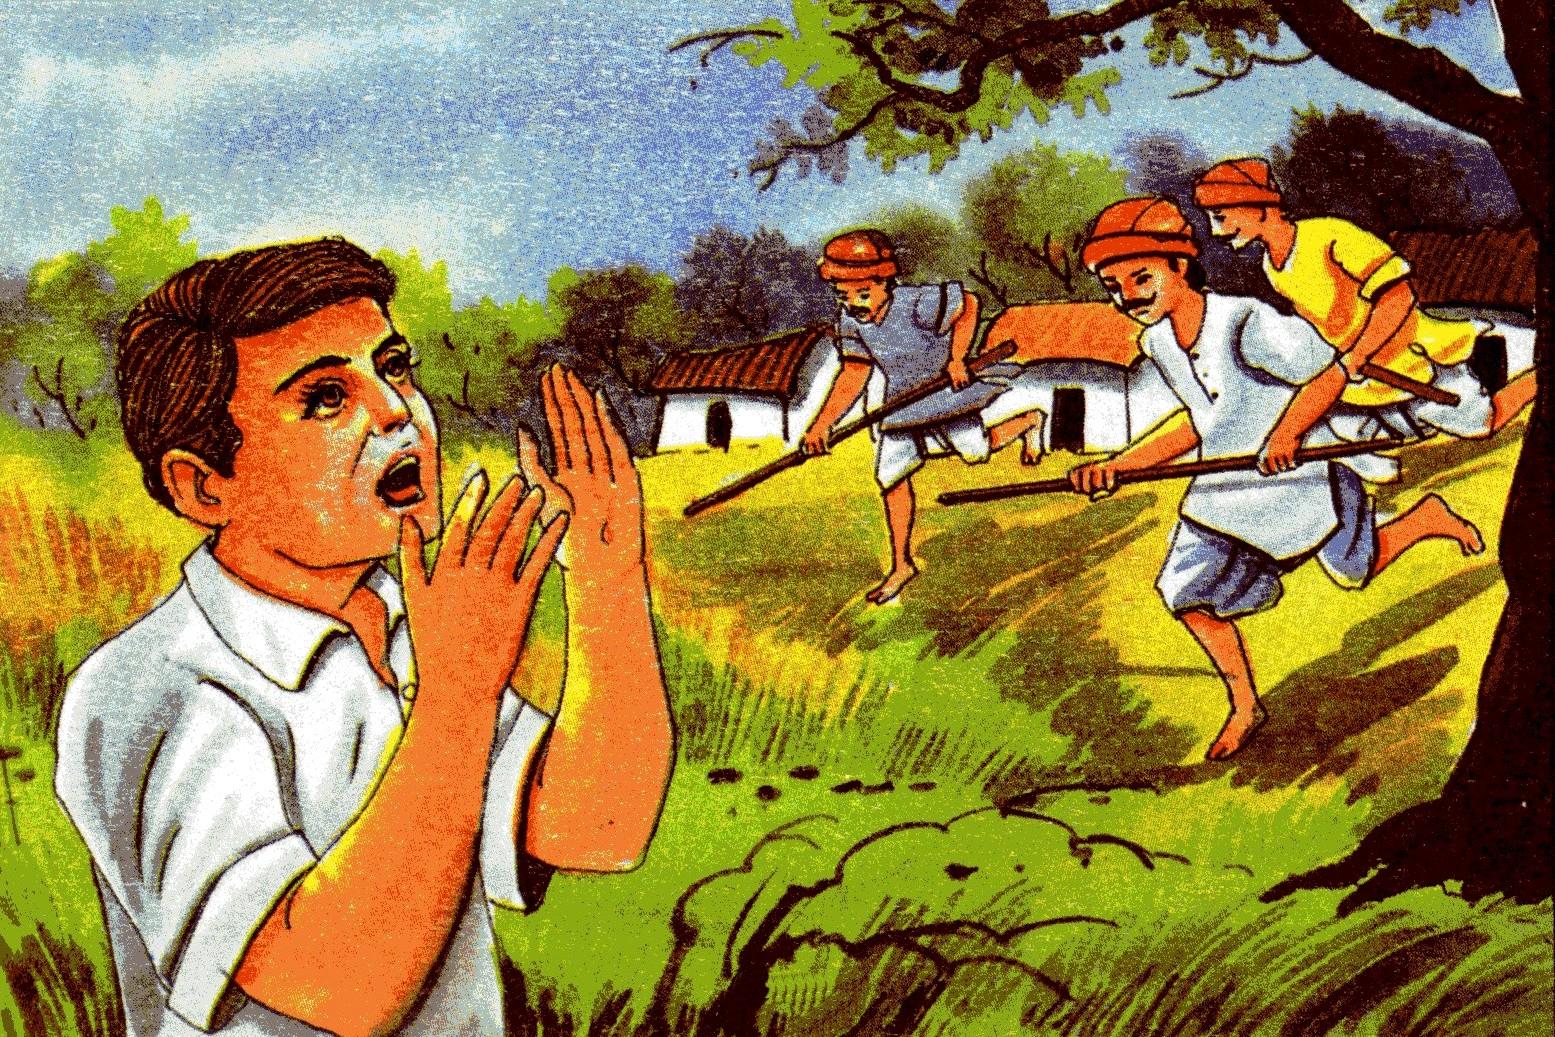 English Community: The Shepherd Boy